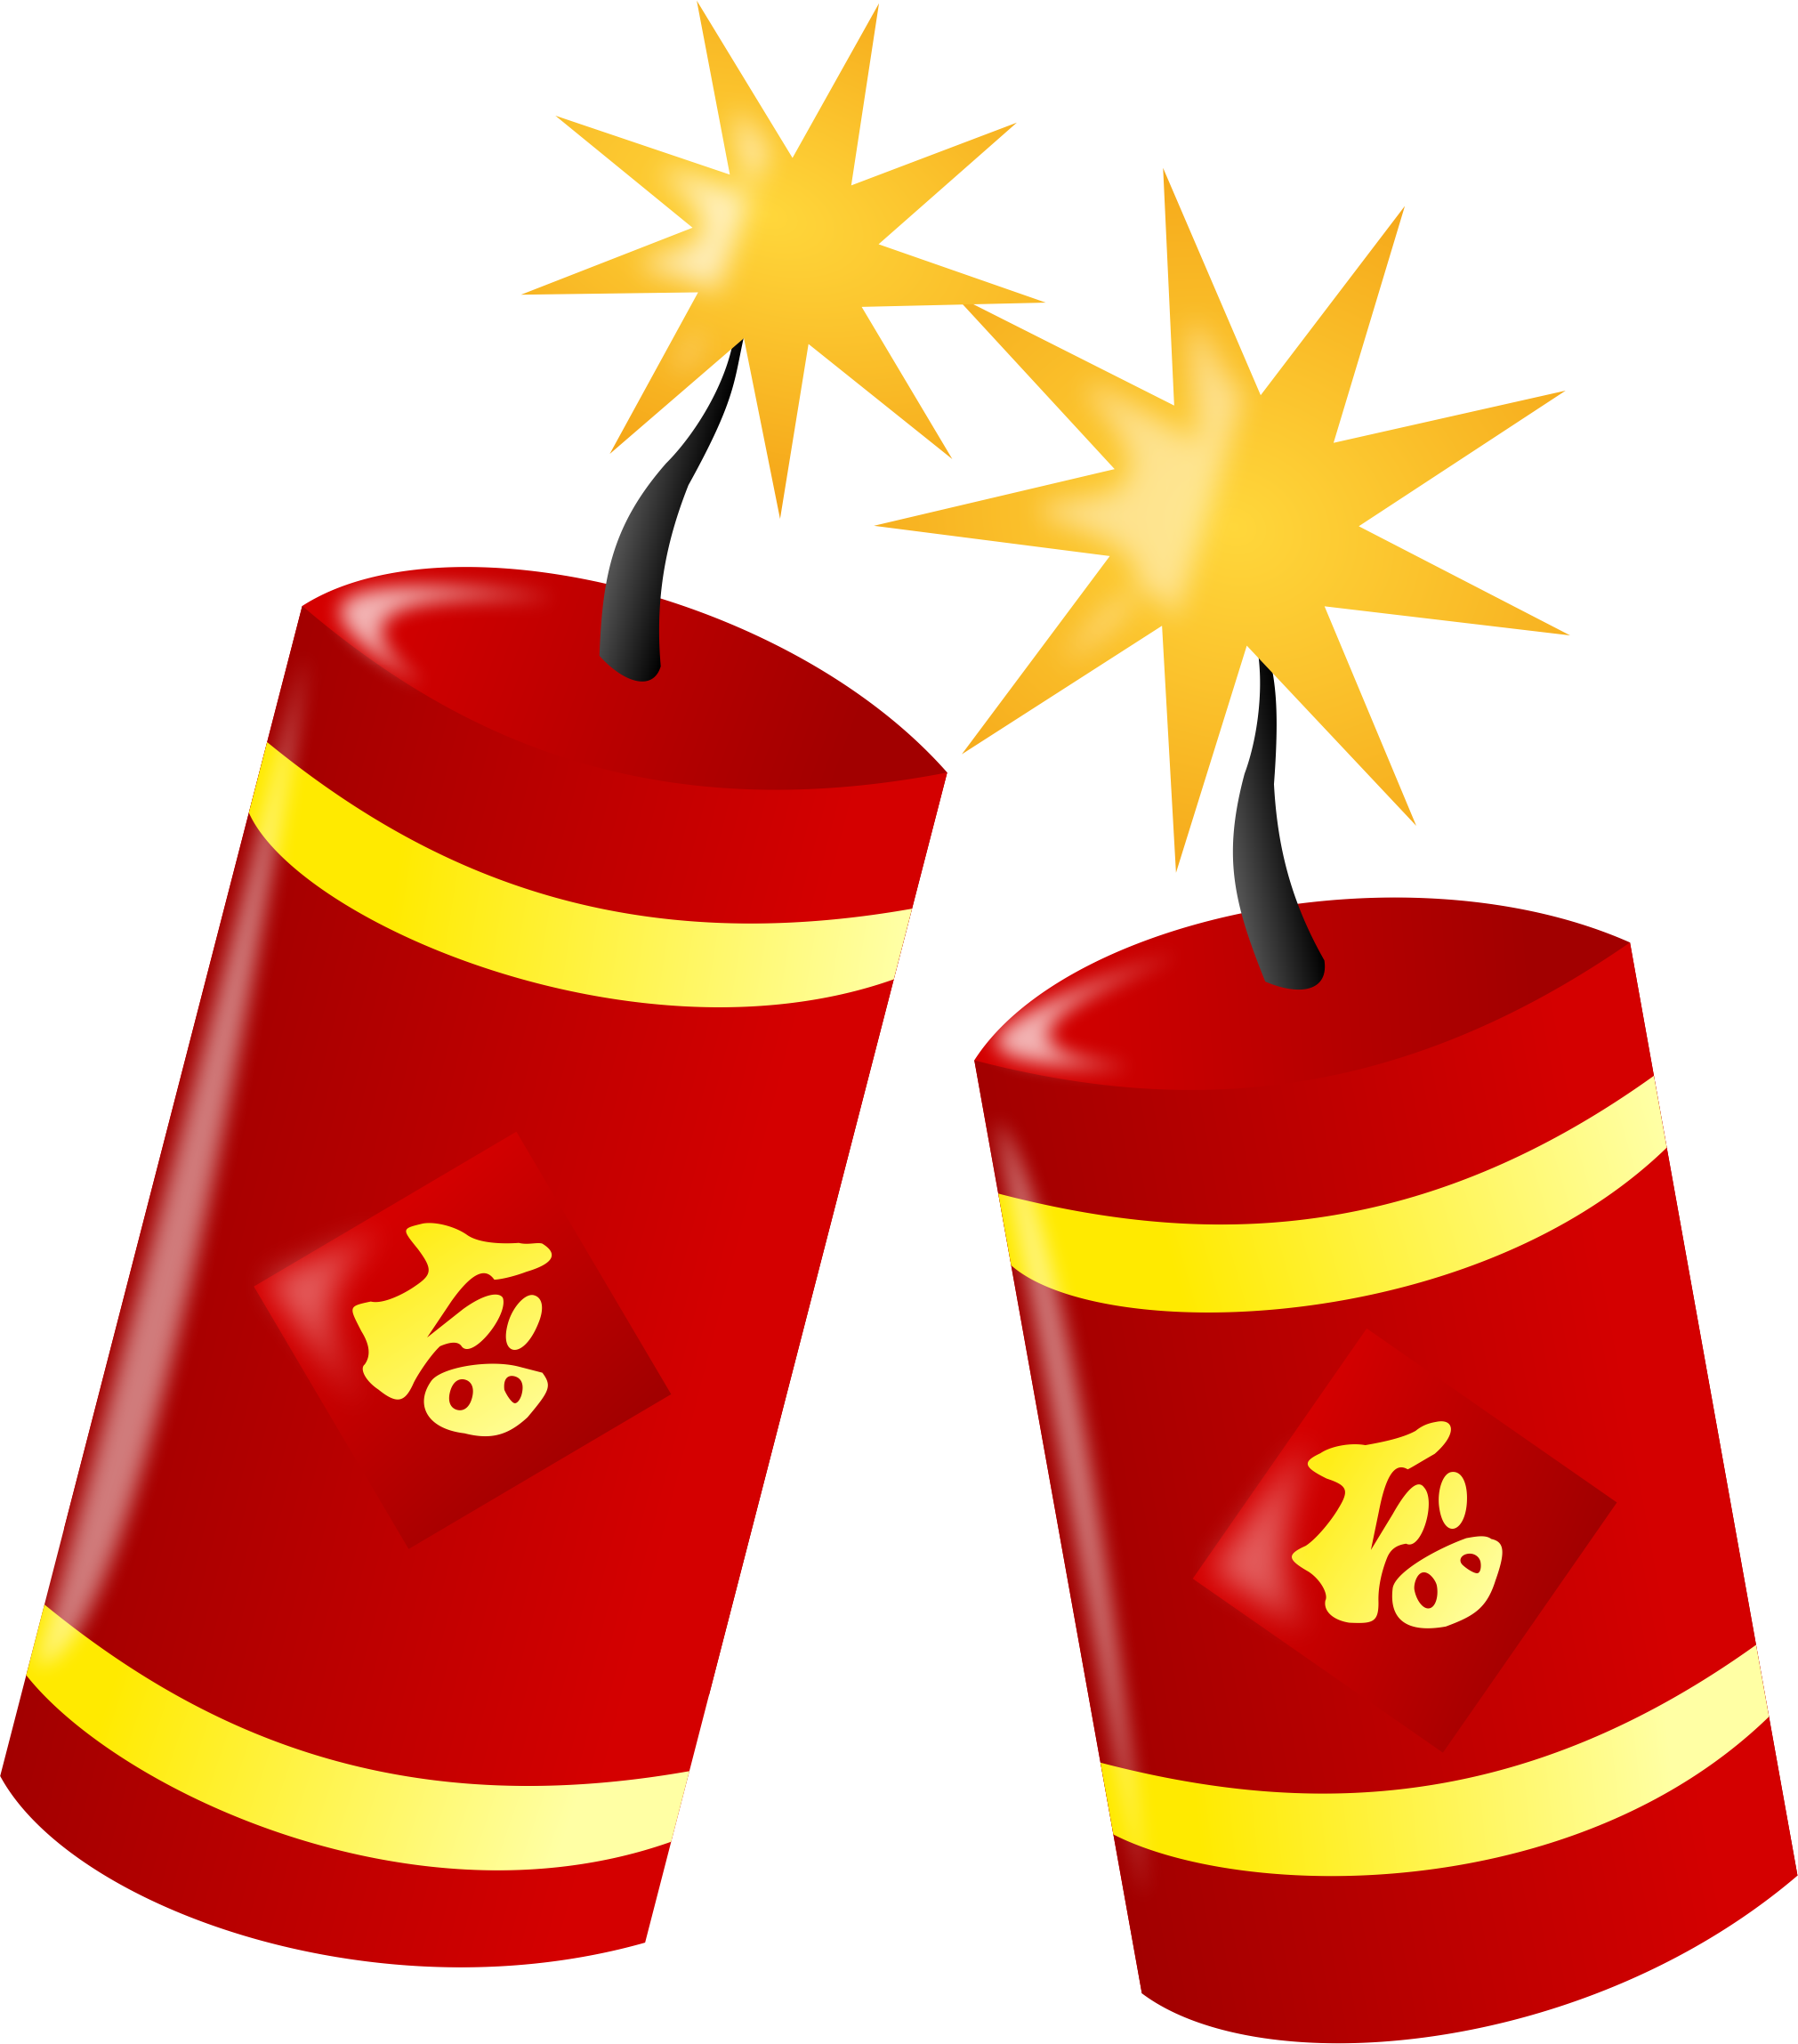 Fire noshadow big image. Cracker clipart package